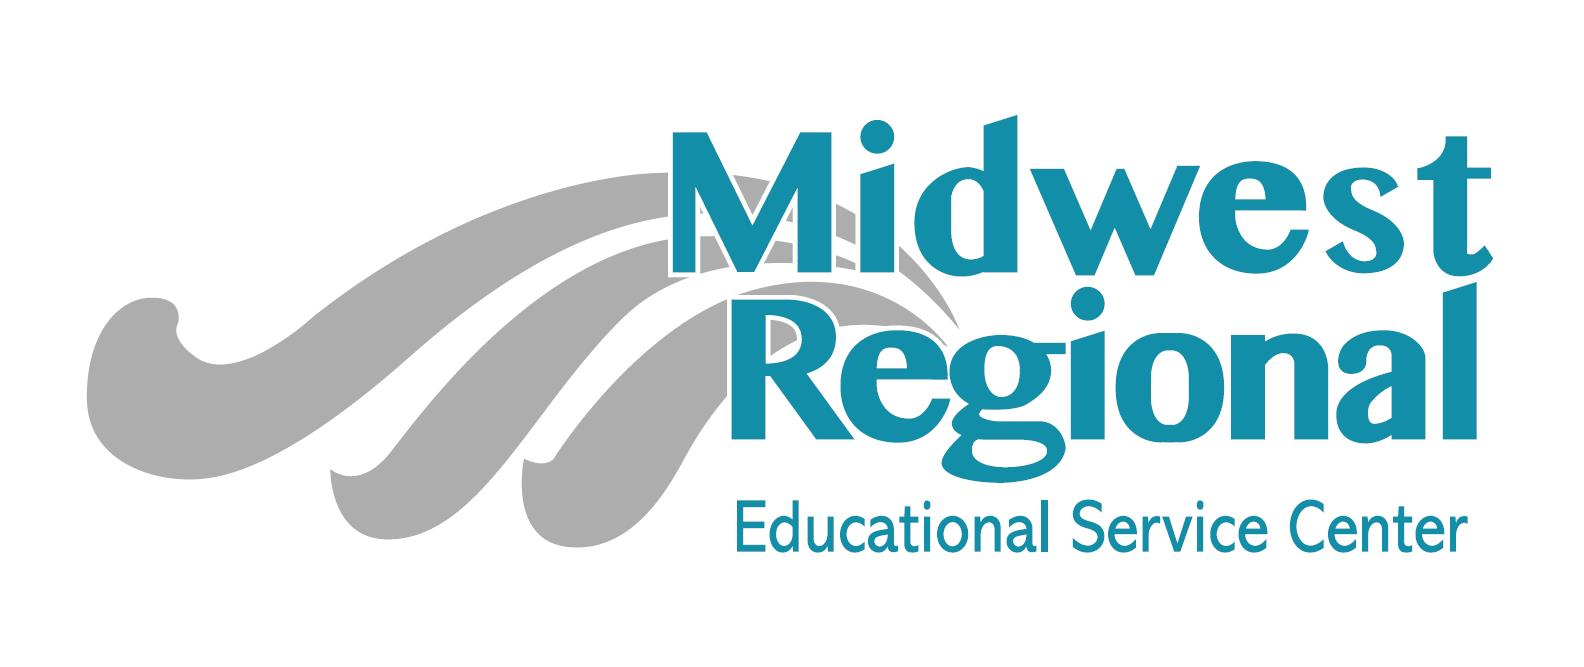 Midwest Regional ESC